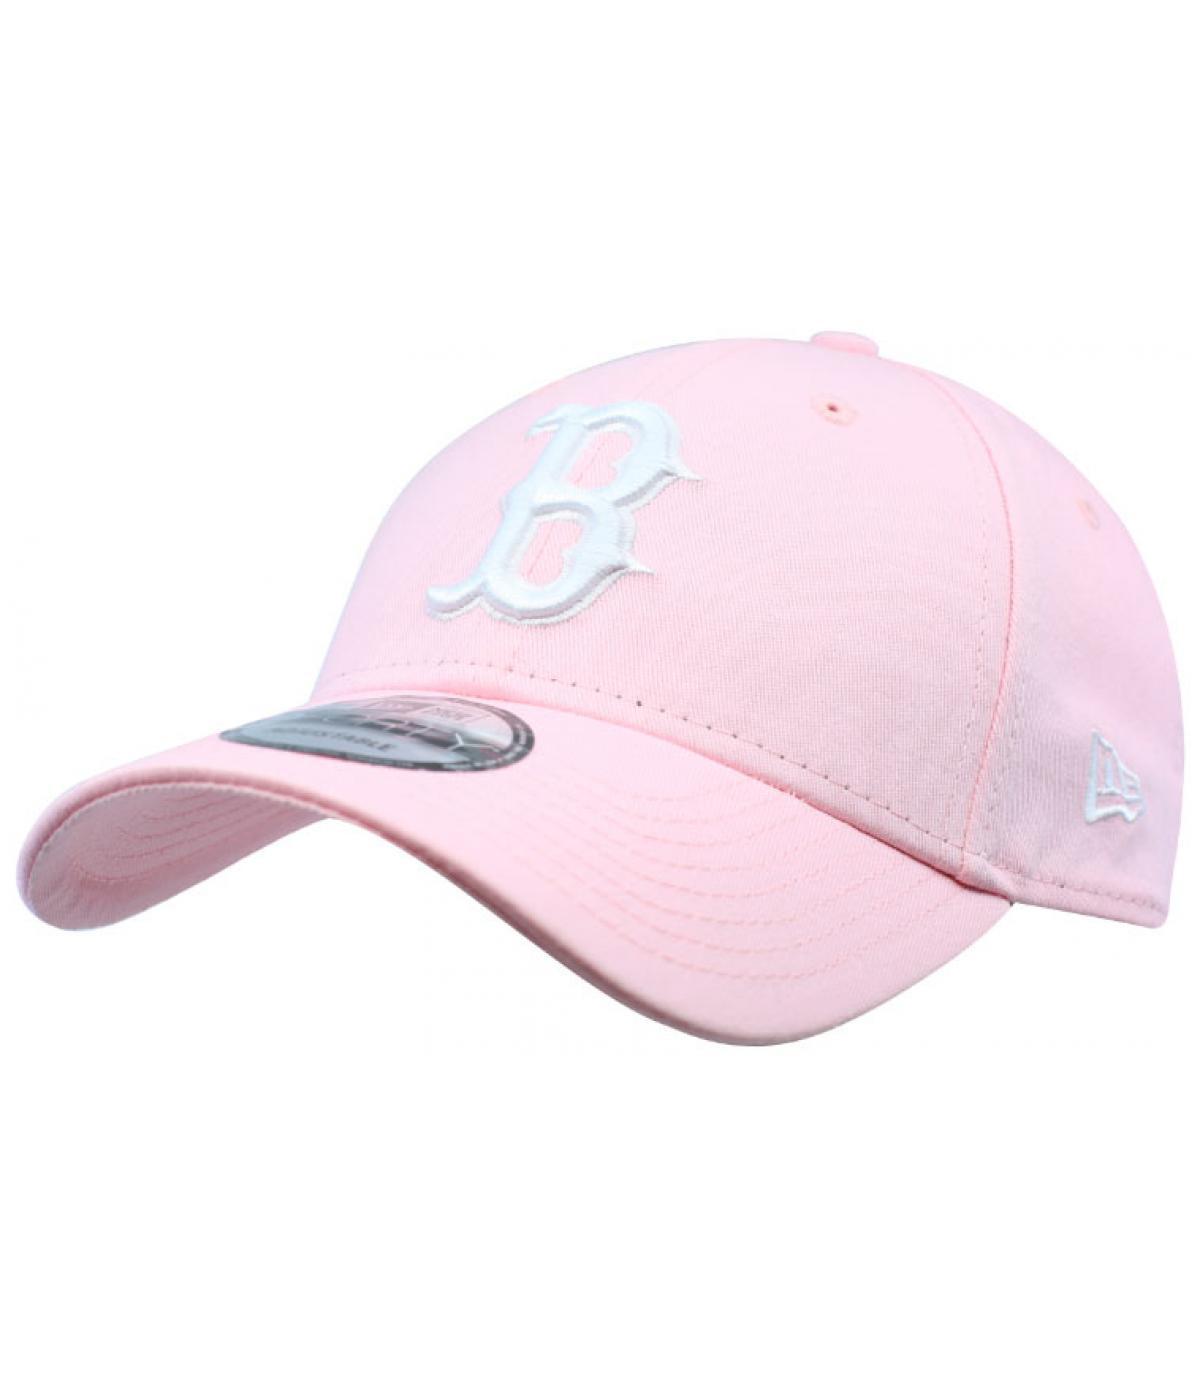 Details Cap Kids League Ess Boston 9Forty pink - Abbildung 2